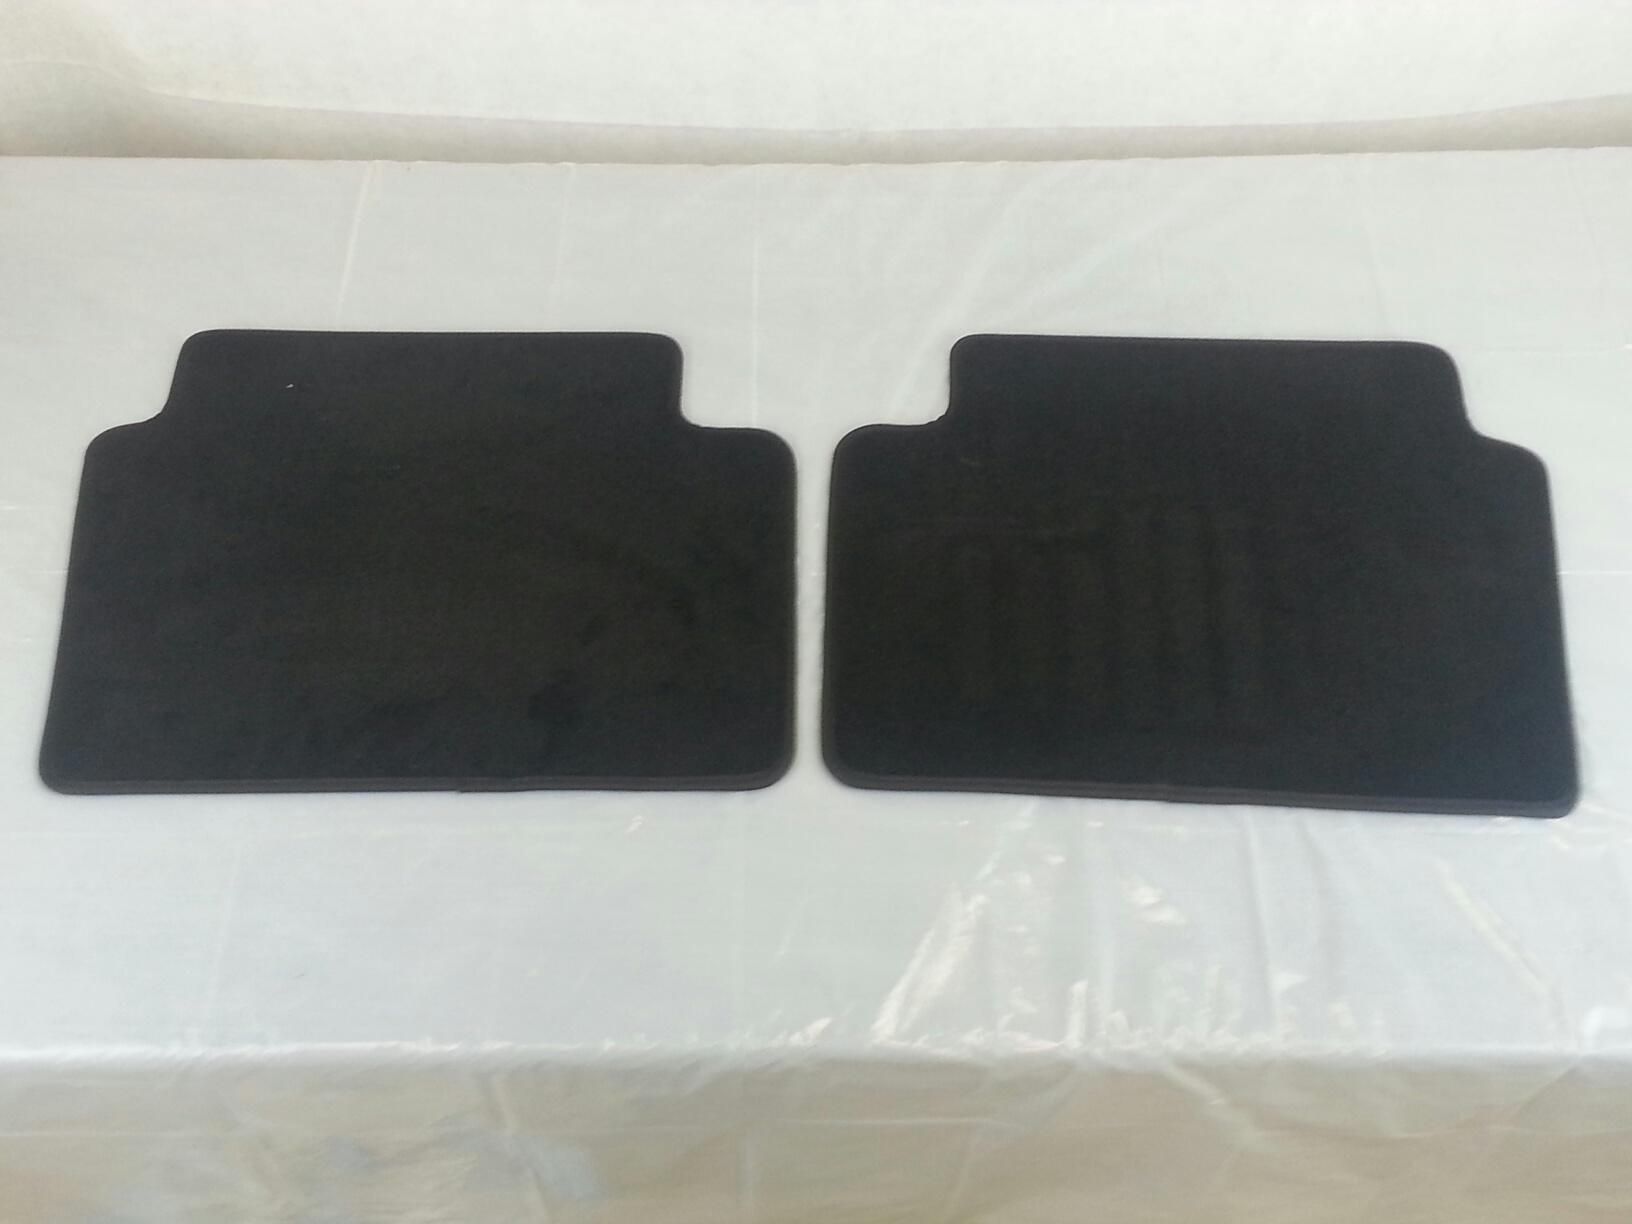 Floor mats mazda 3 - Item Specifics